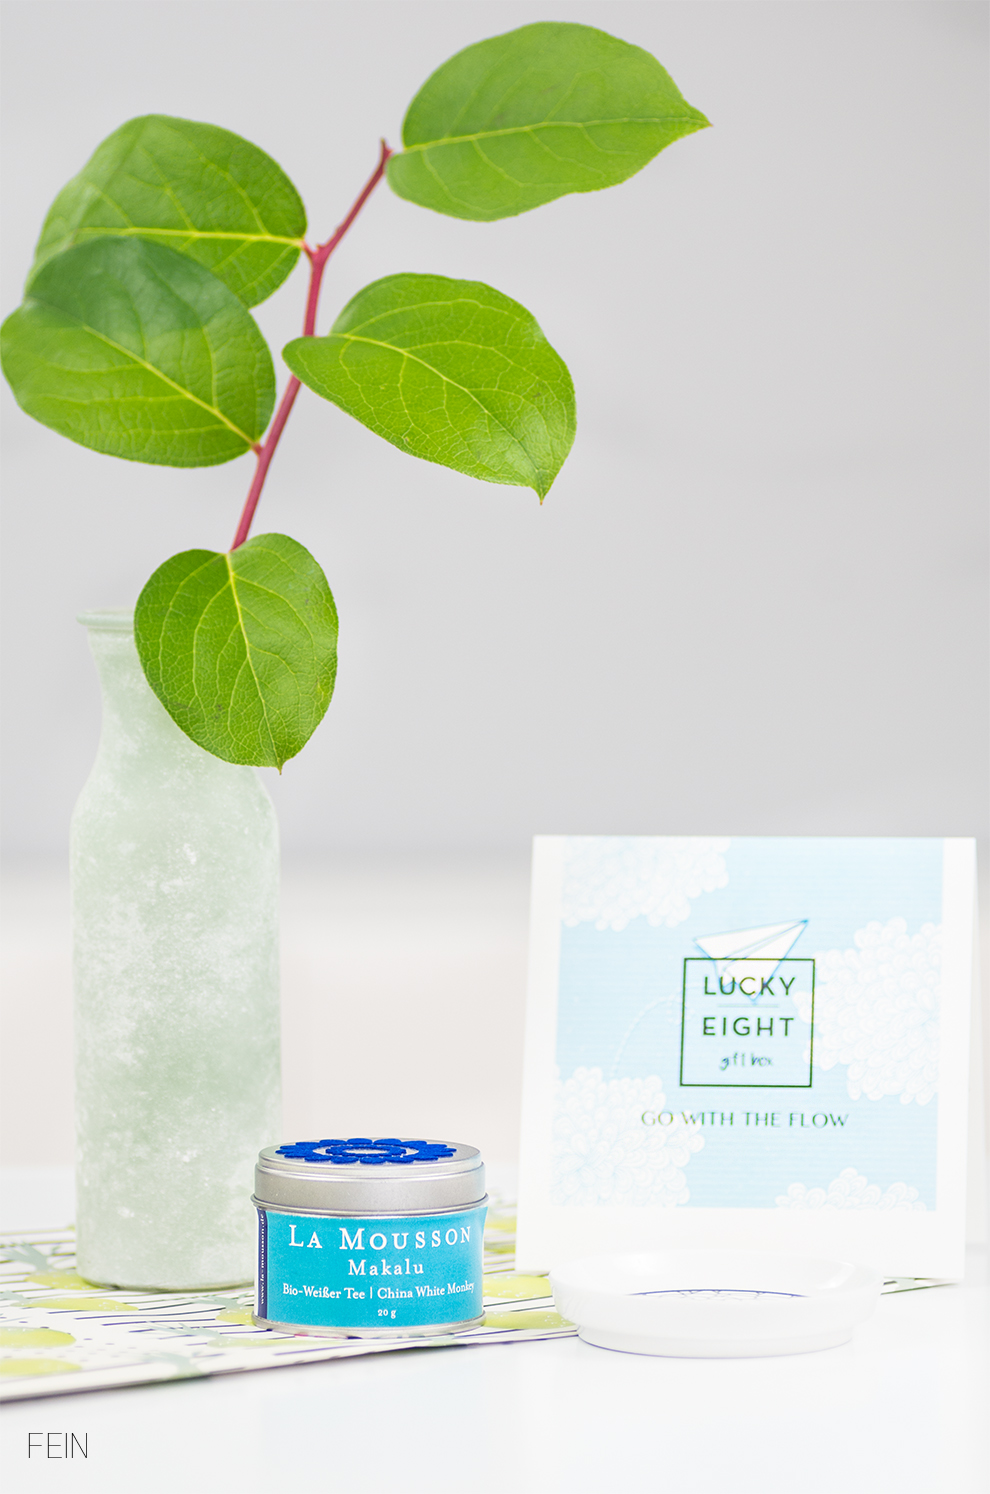 Lucky Eight Gift Box